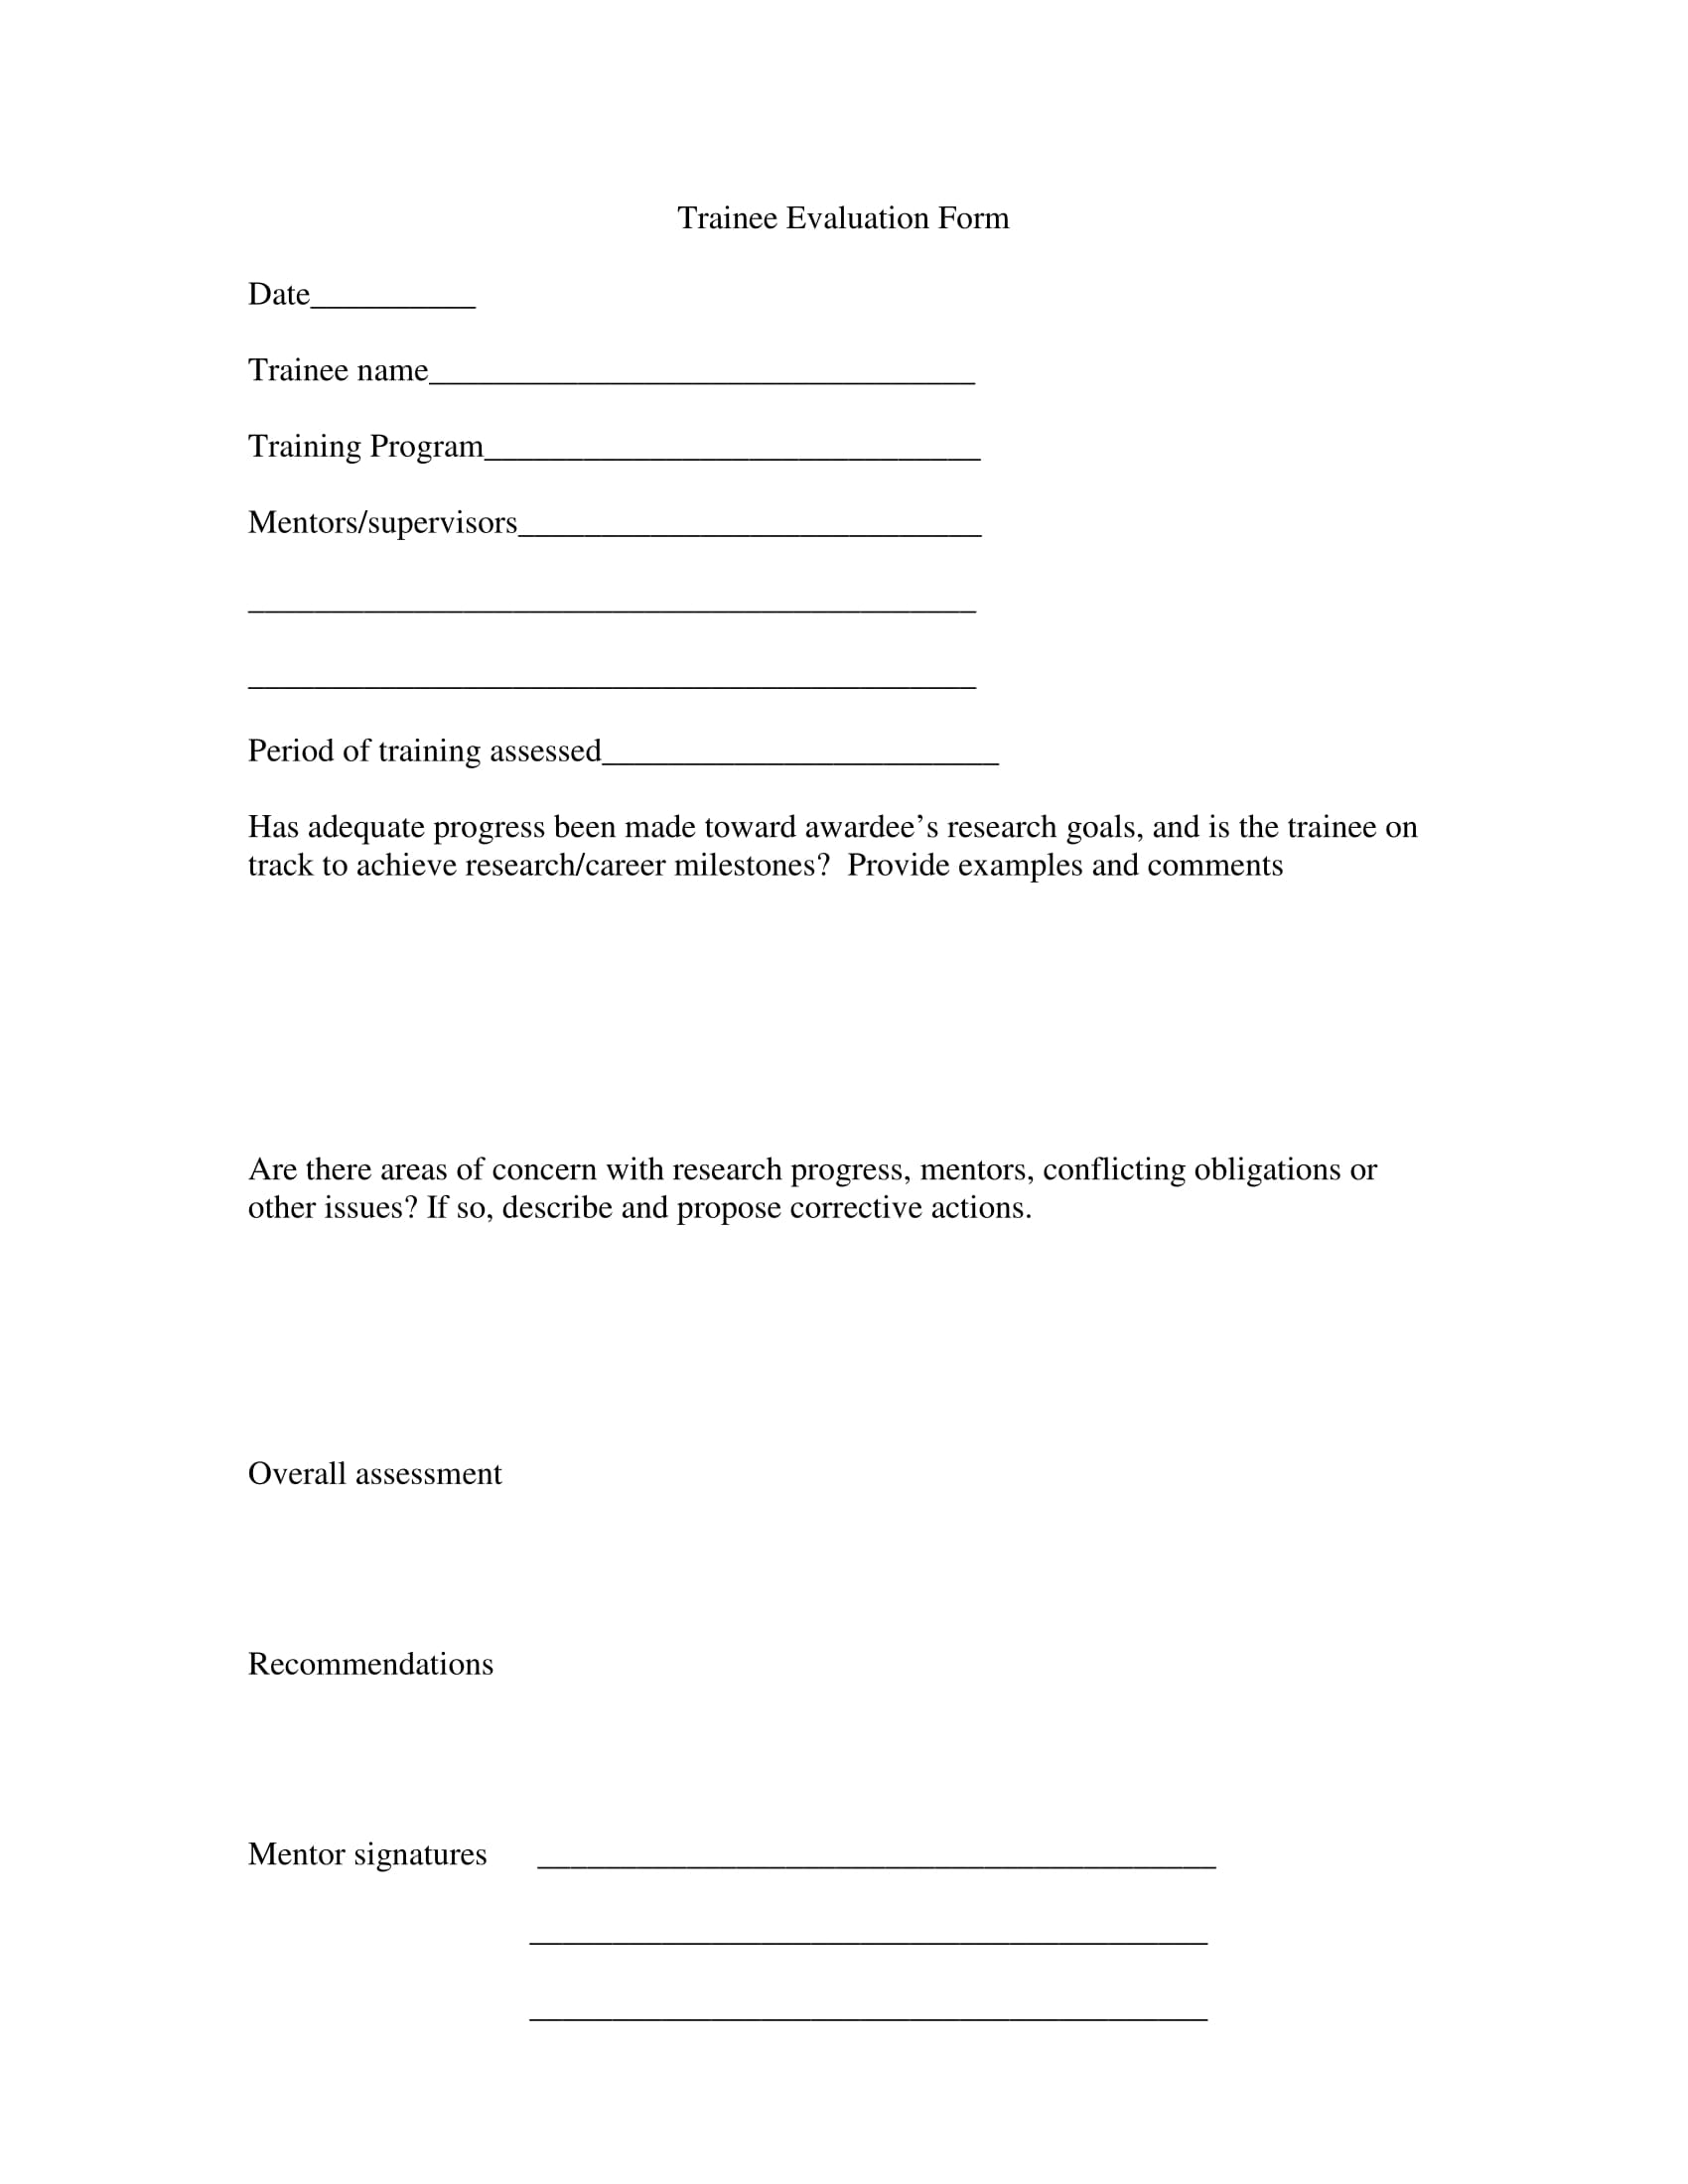 Training Feedback Form Free Word Purchase Receipt Template Free General  Trainee Evaluation Form 1 Training Feedback